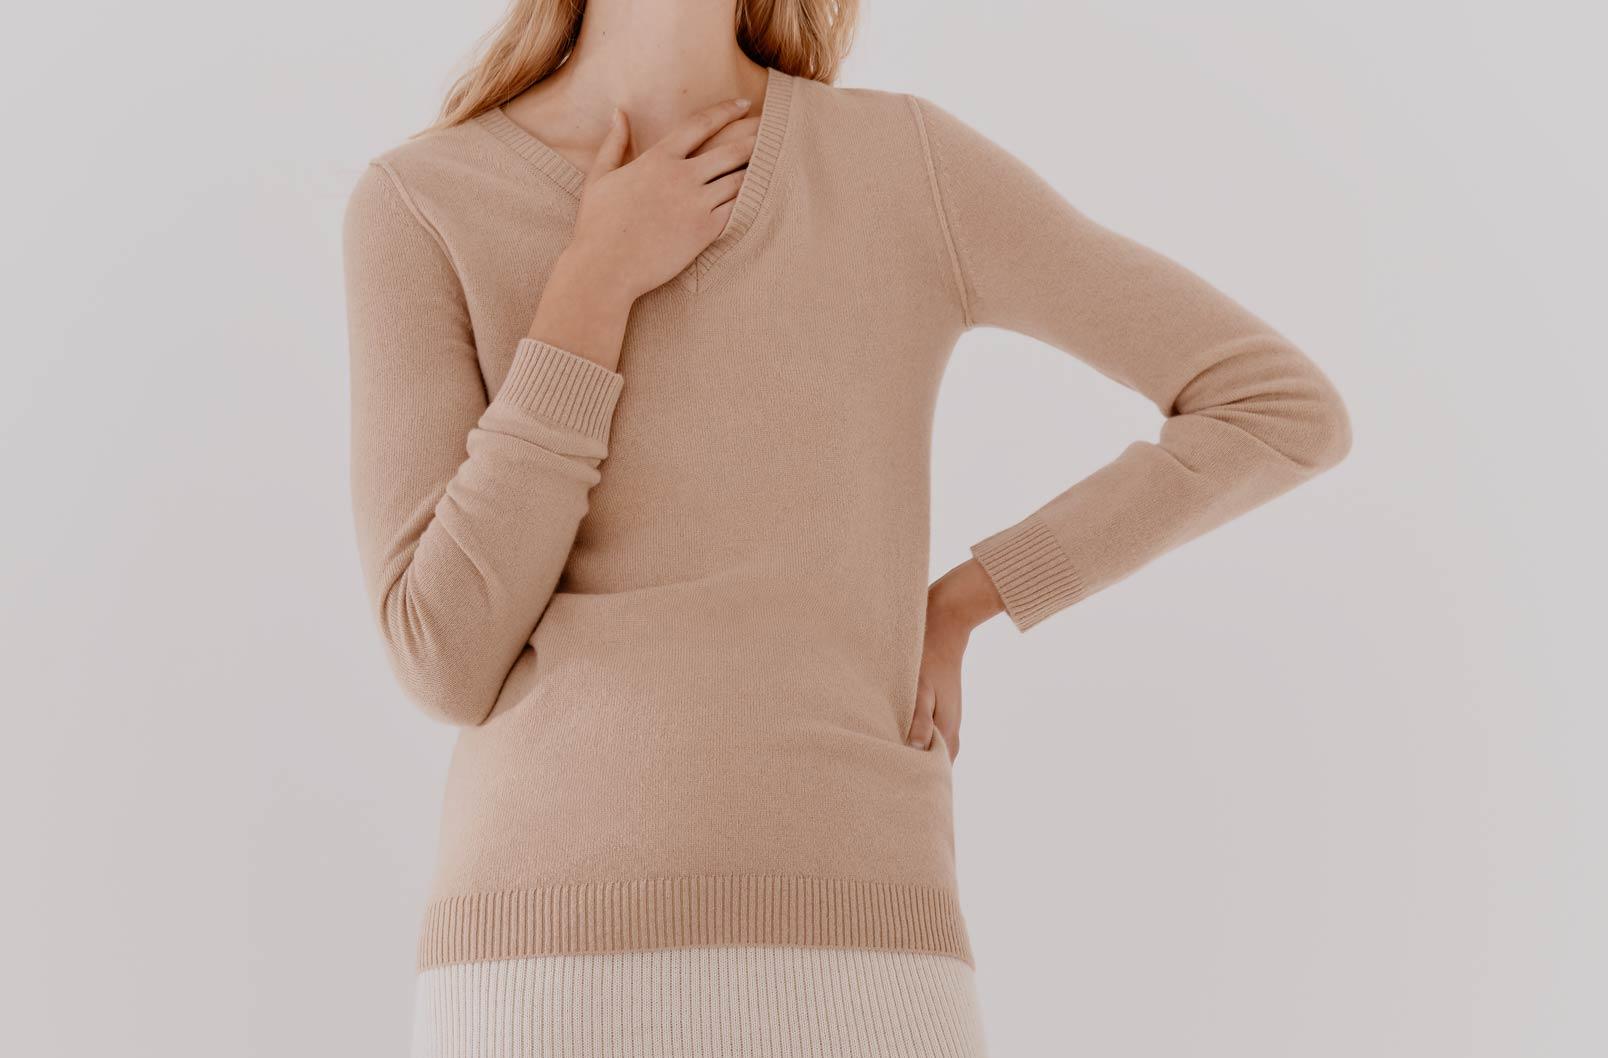 Model wearing Wool Cashmere Slim V-Neck Sweater